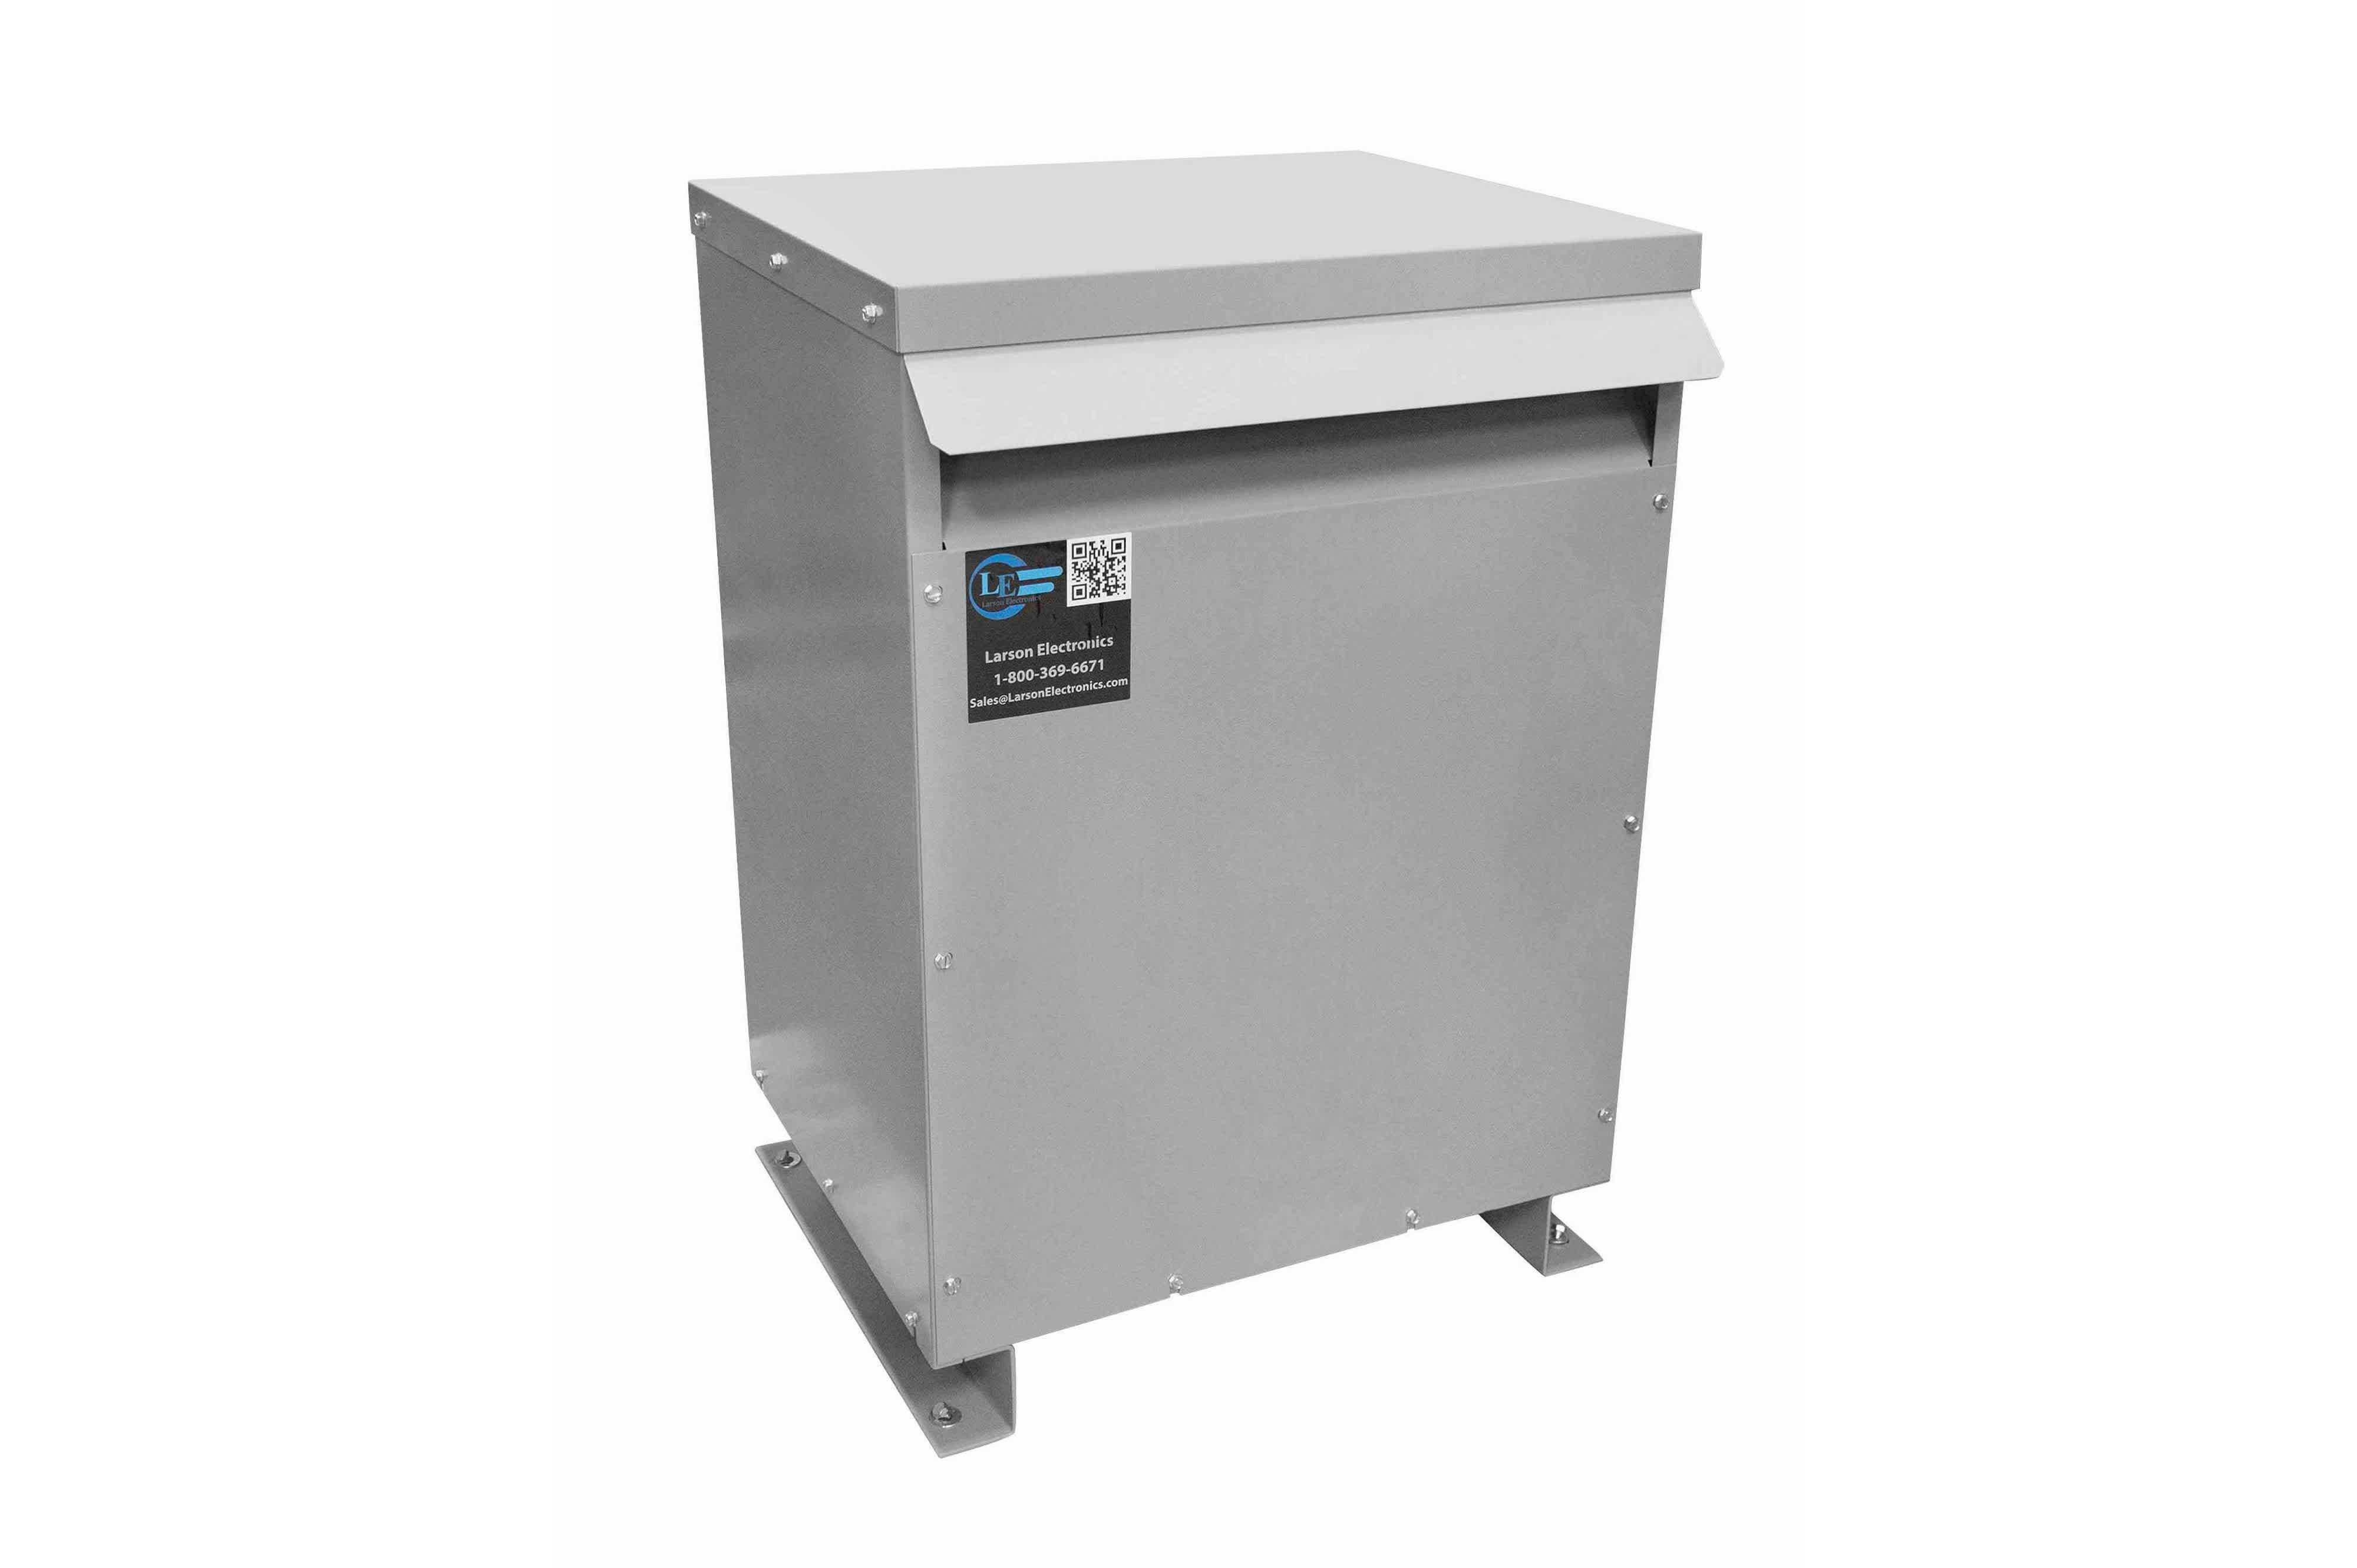 167 kVA 3PH DOE Transformer, 480V Delta Primary, 400Y/231 Wye-N Secondary, N3R, Ventilated, 60 Hz